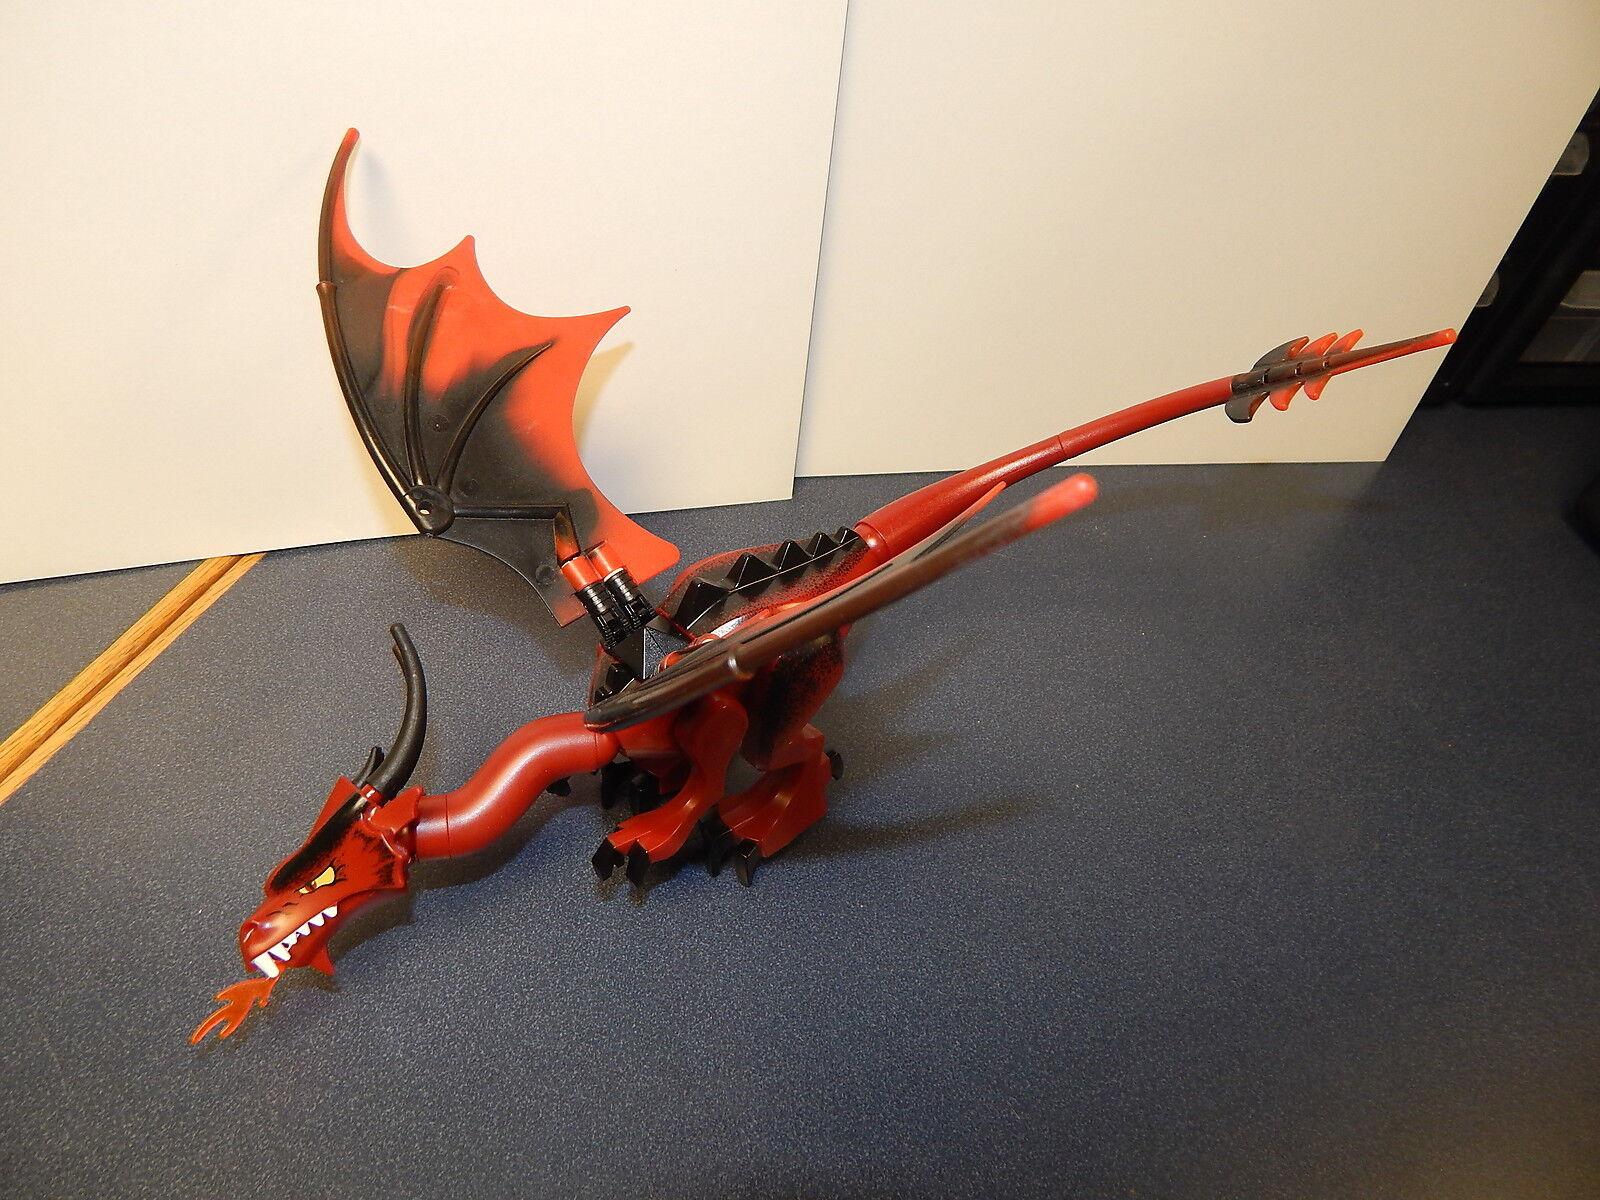 Lego Original Dragon  Fantasy Era  with Dark rosso Head, Complete Assembly 01